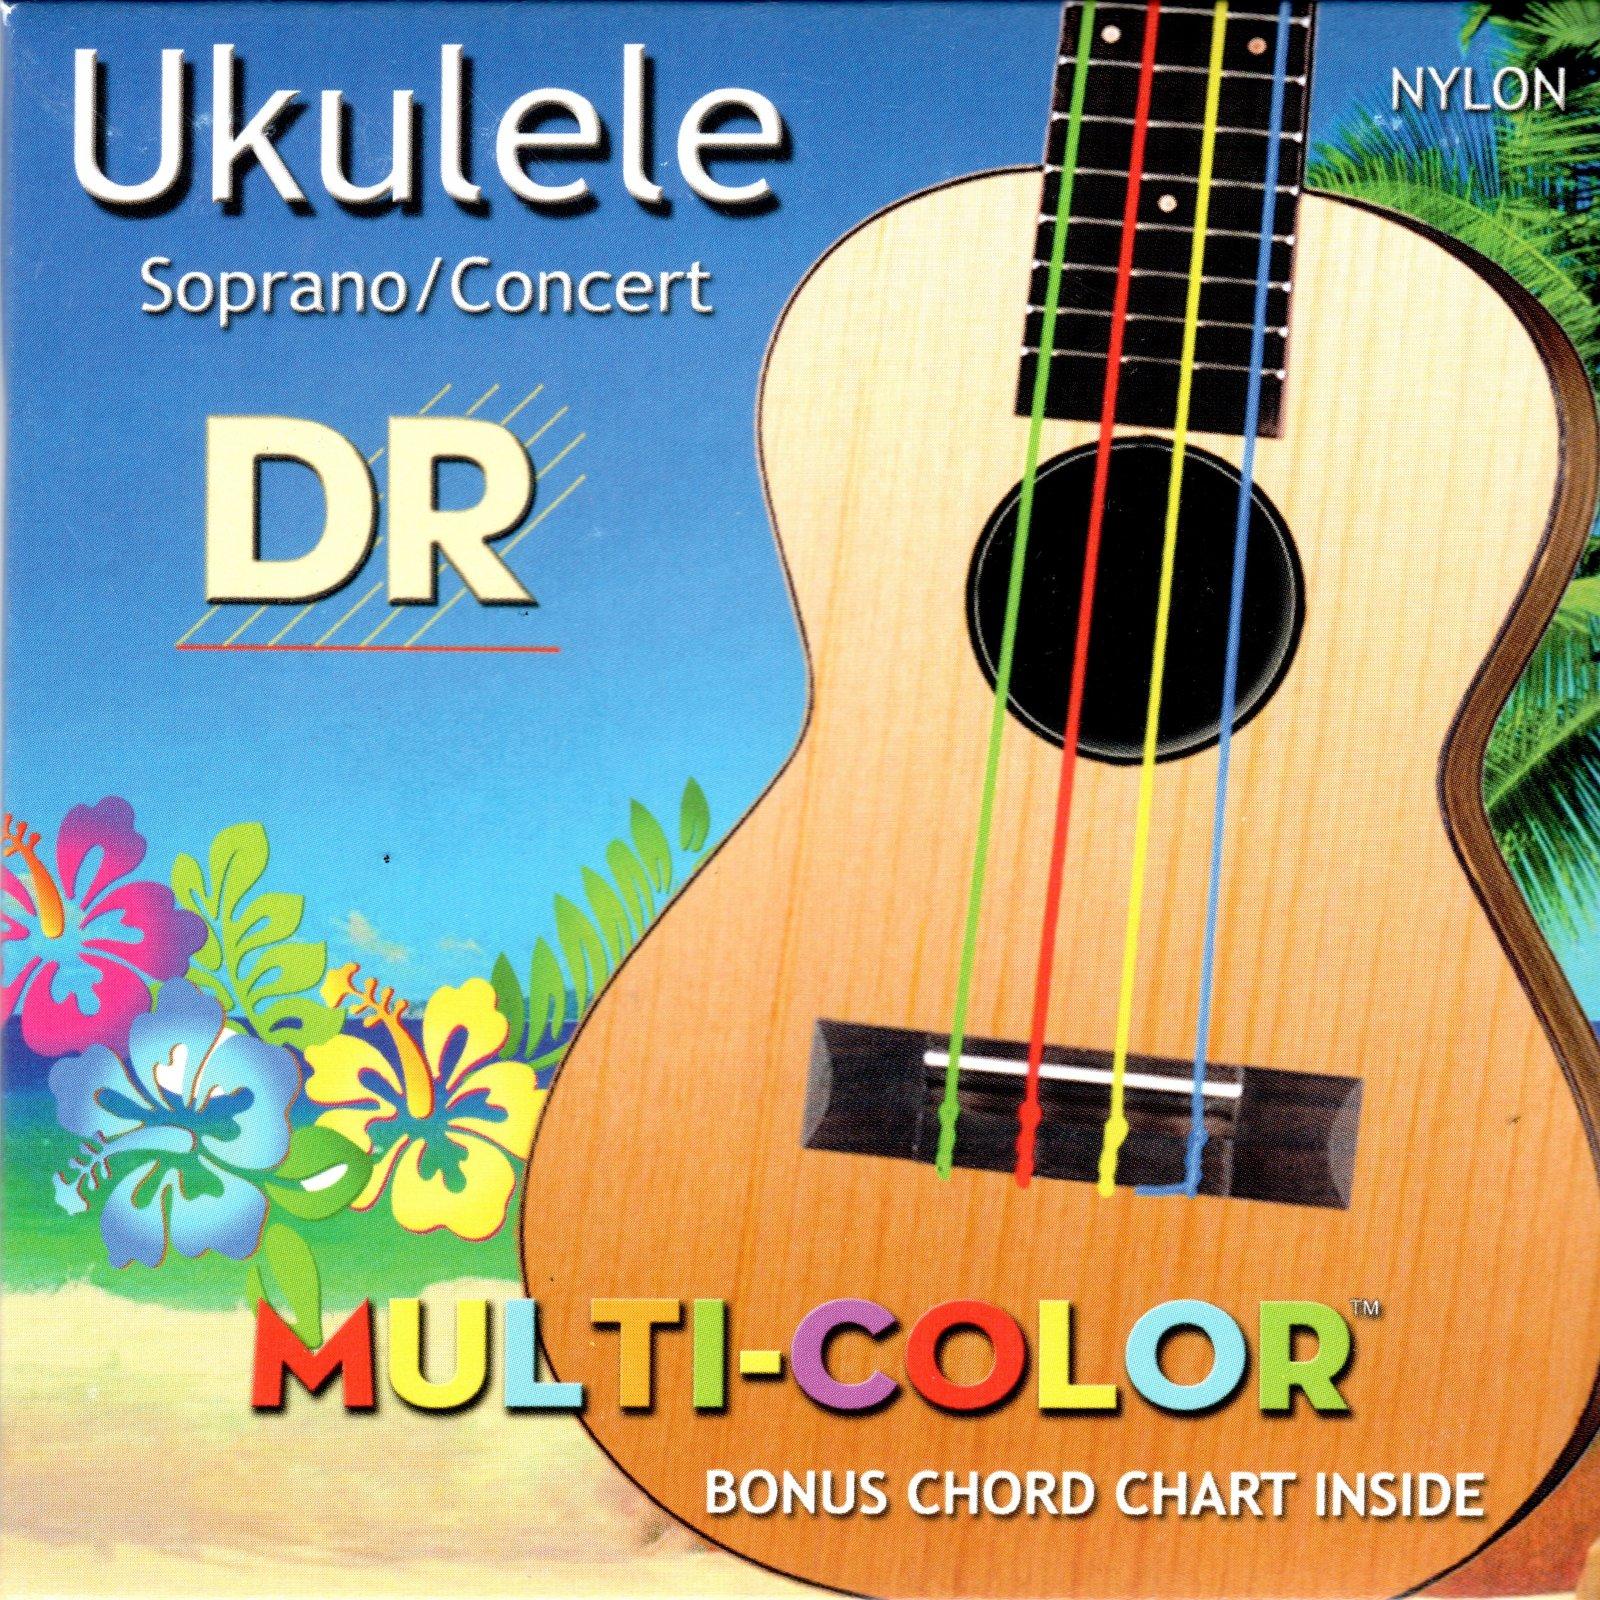 DR Strings UMCSC Multi-Color Ukulele Strings, Soprano/Concert